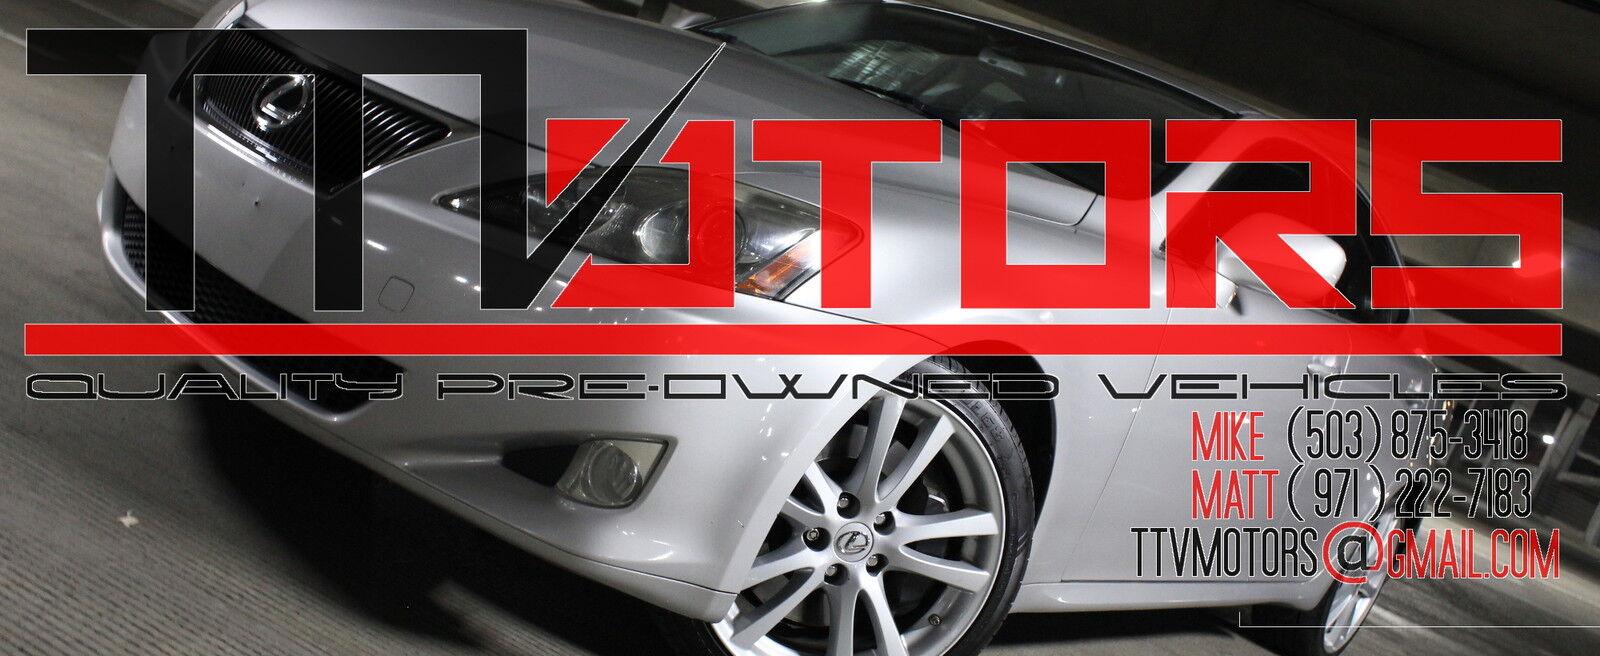 TTV Motors llc